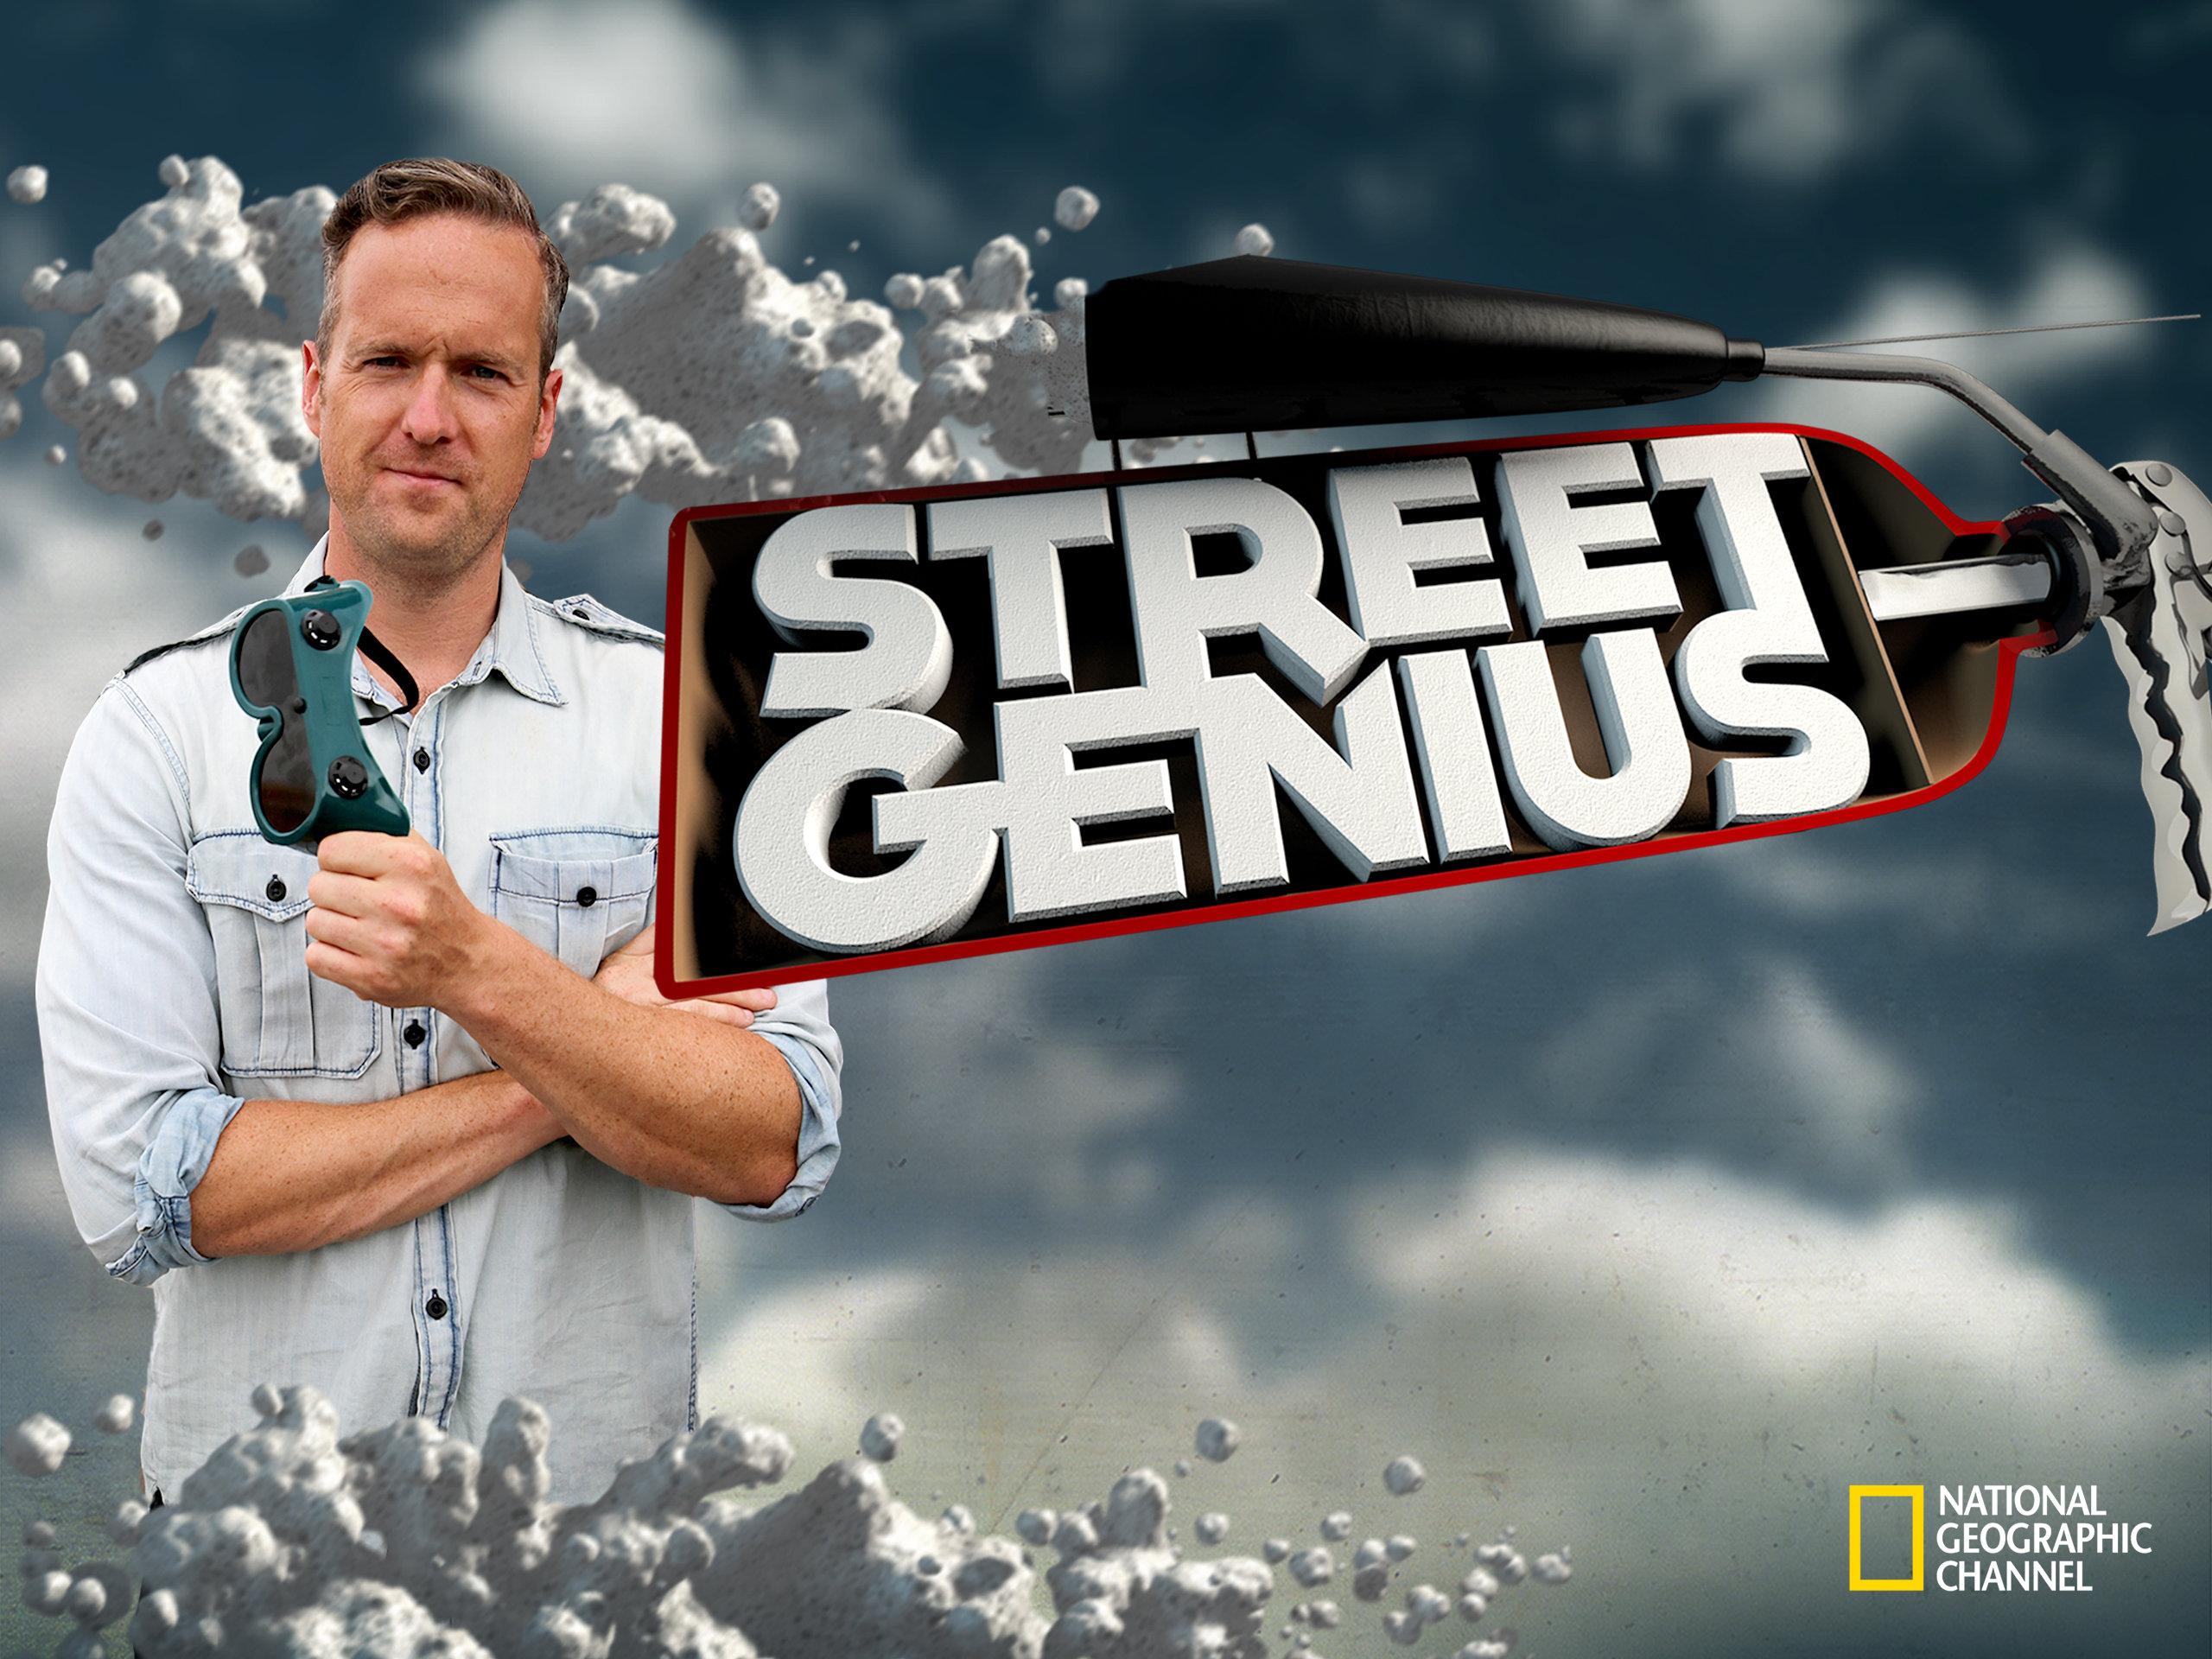 Watch Street Genius Season 2 Episode 2: Falling, Floating